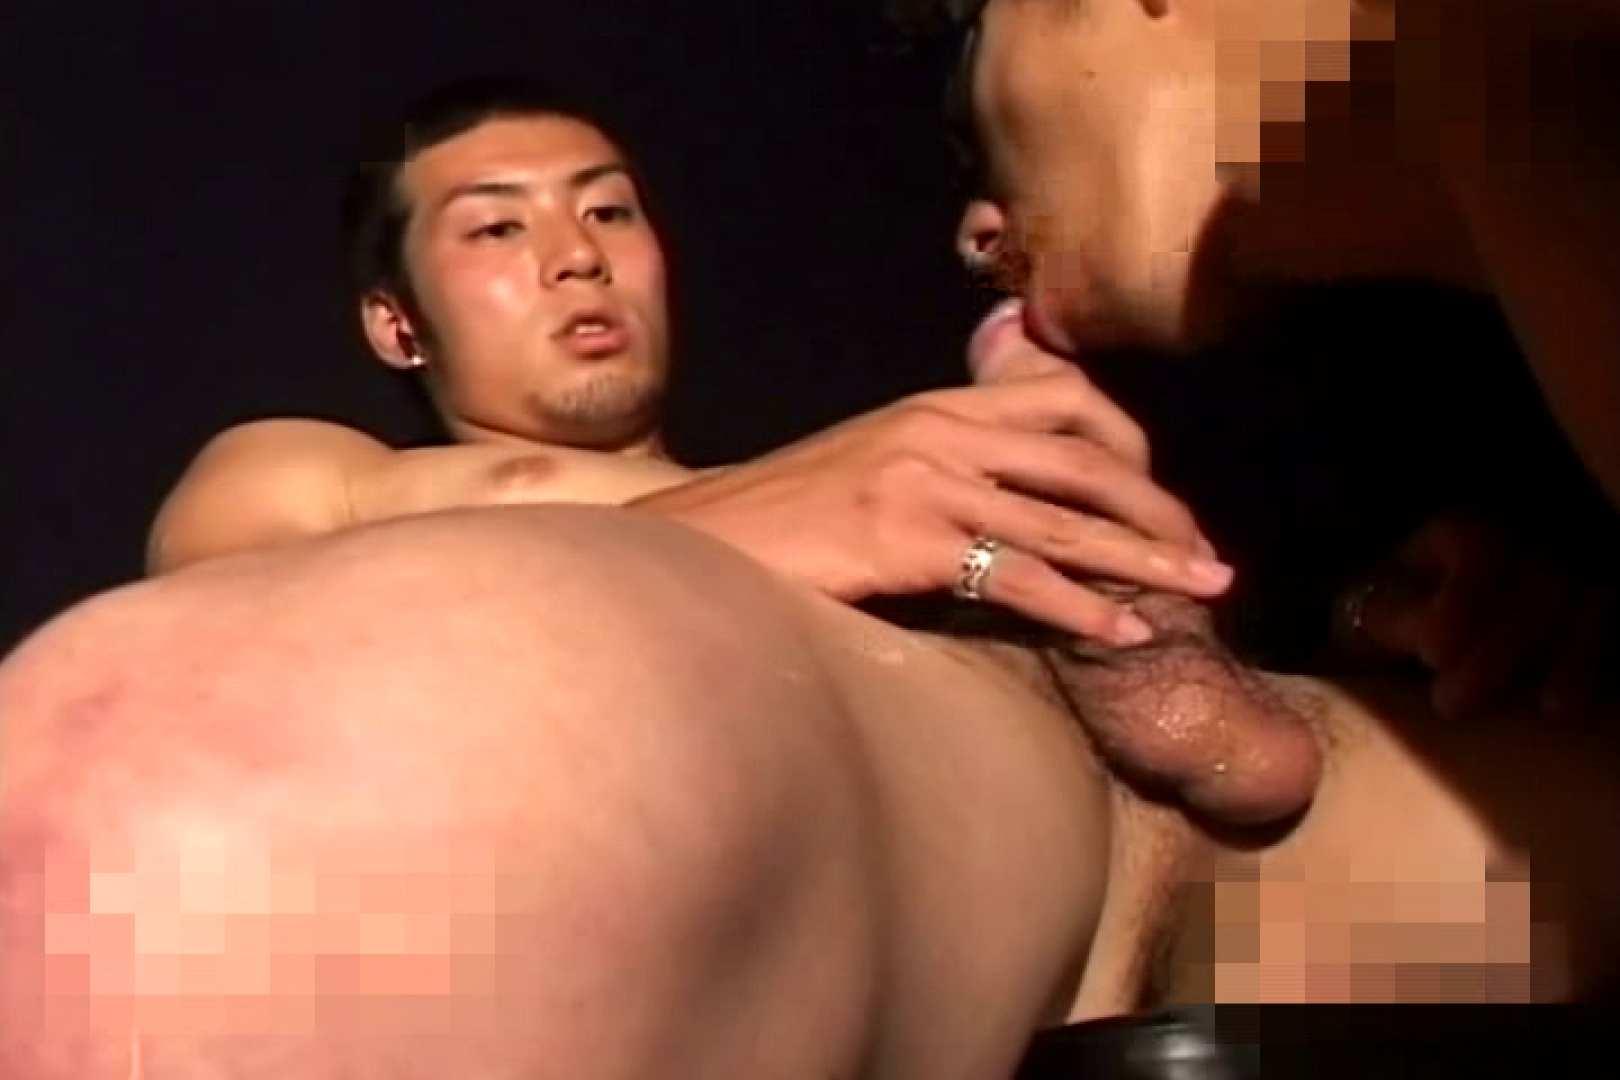 Beautiful muscle モッコリ野郎達!Vol.04 フェラDE絶頂 | イケメンのsex  103pic 93